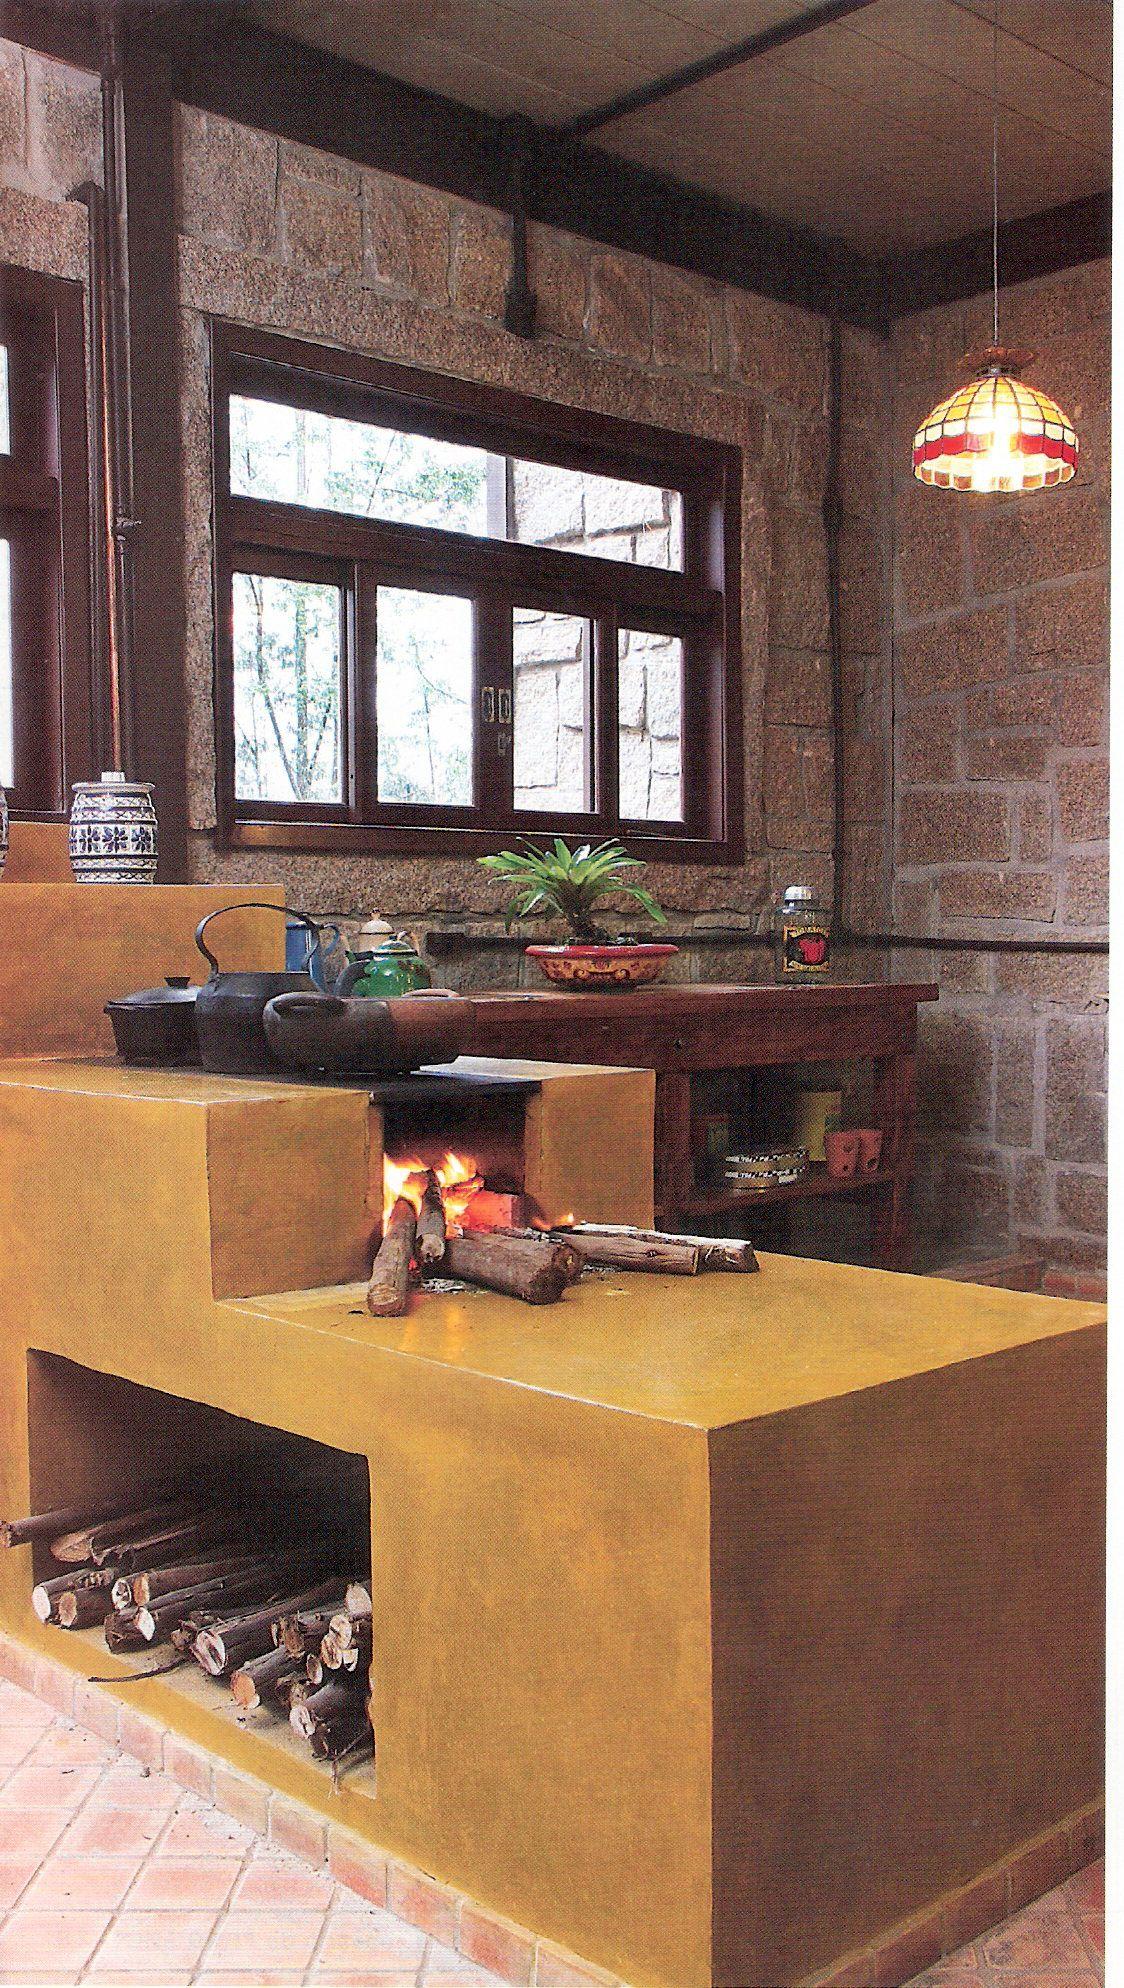 Cozy brasilian kitchen kitchen pinterest cozy kitchens and stove